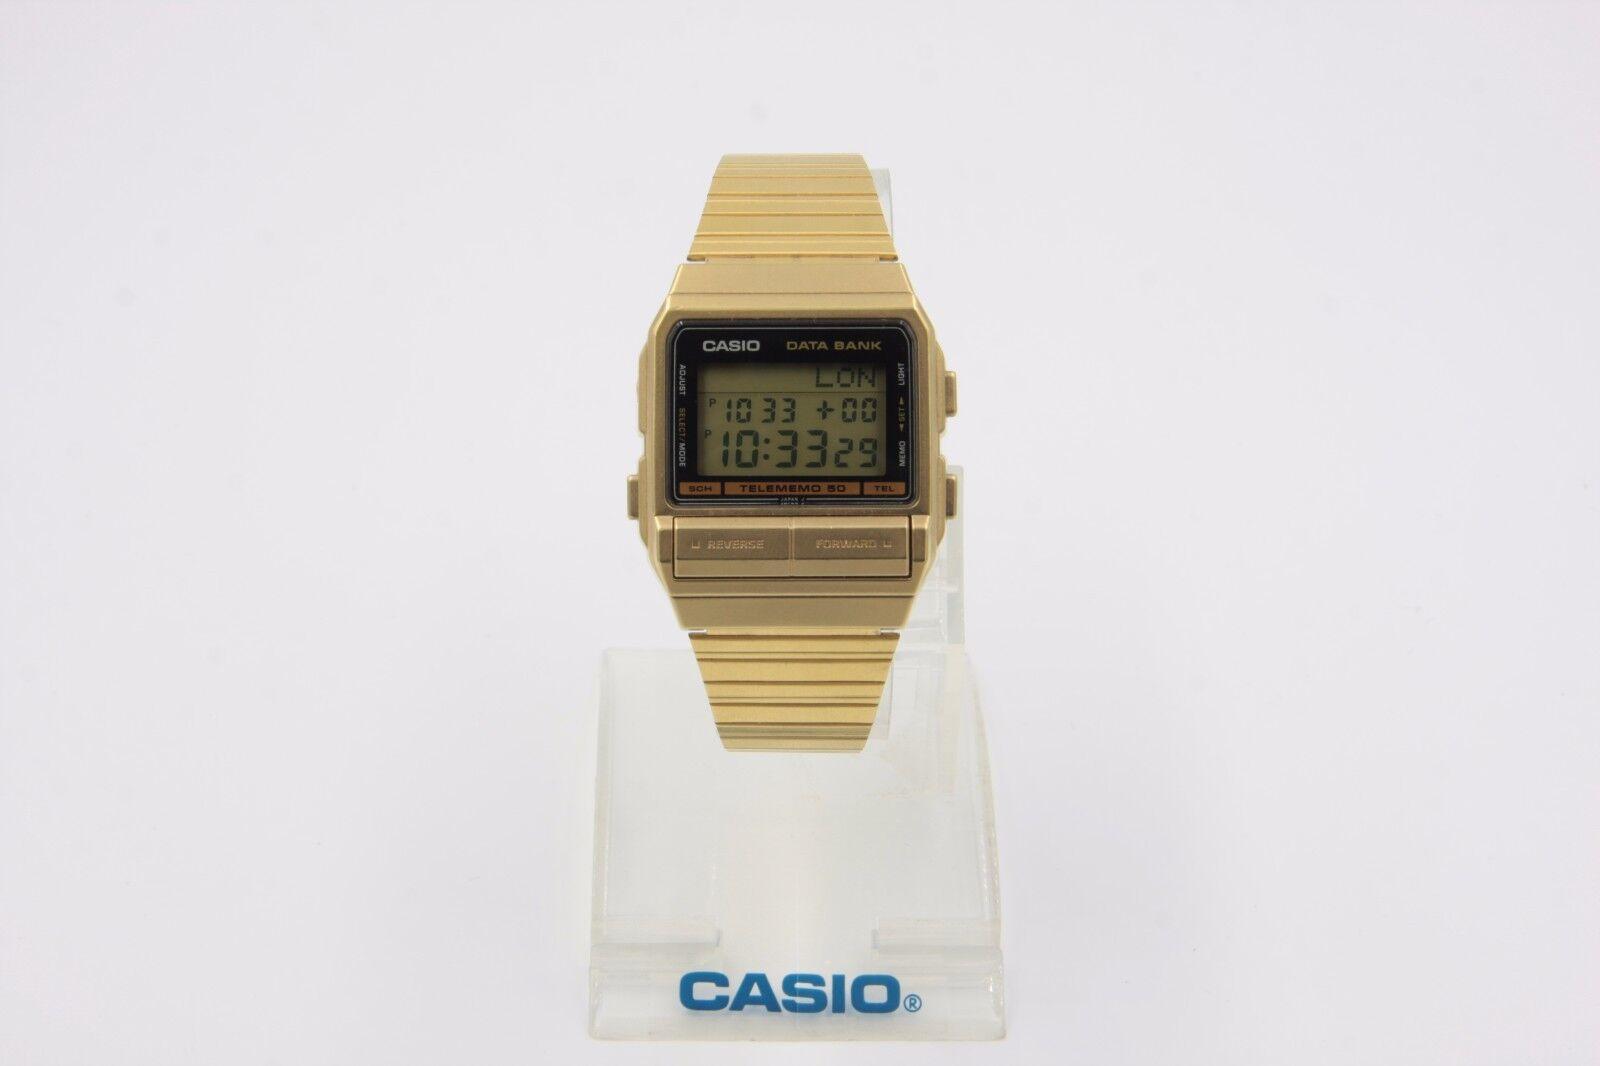 98675e5f7ae Casio DB-520GA Original Vintage Rare Databank Watch Telememo 50 DB ...